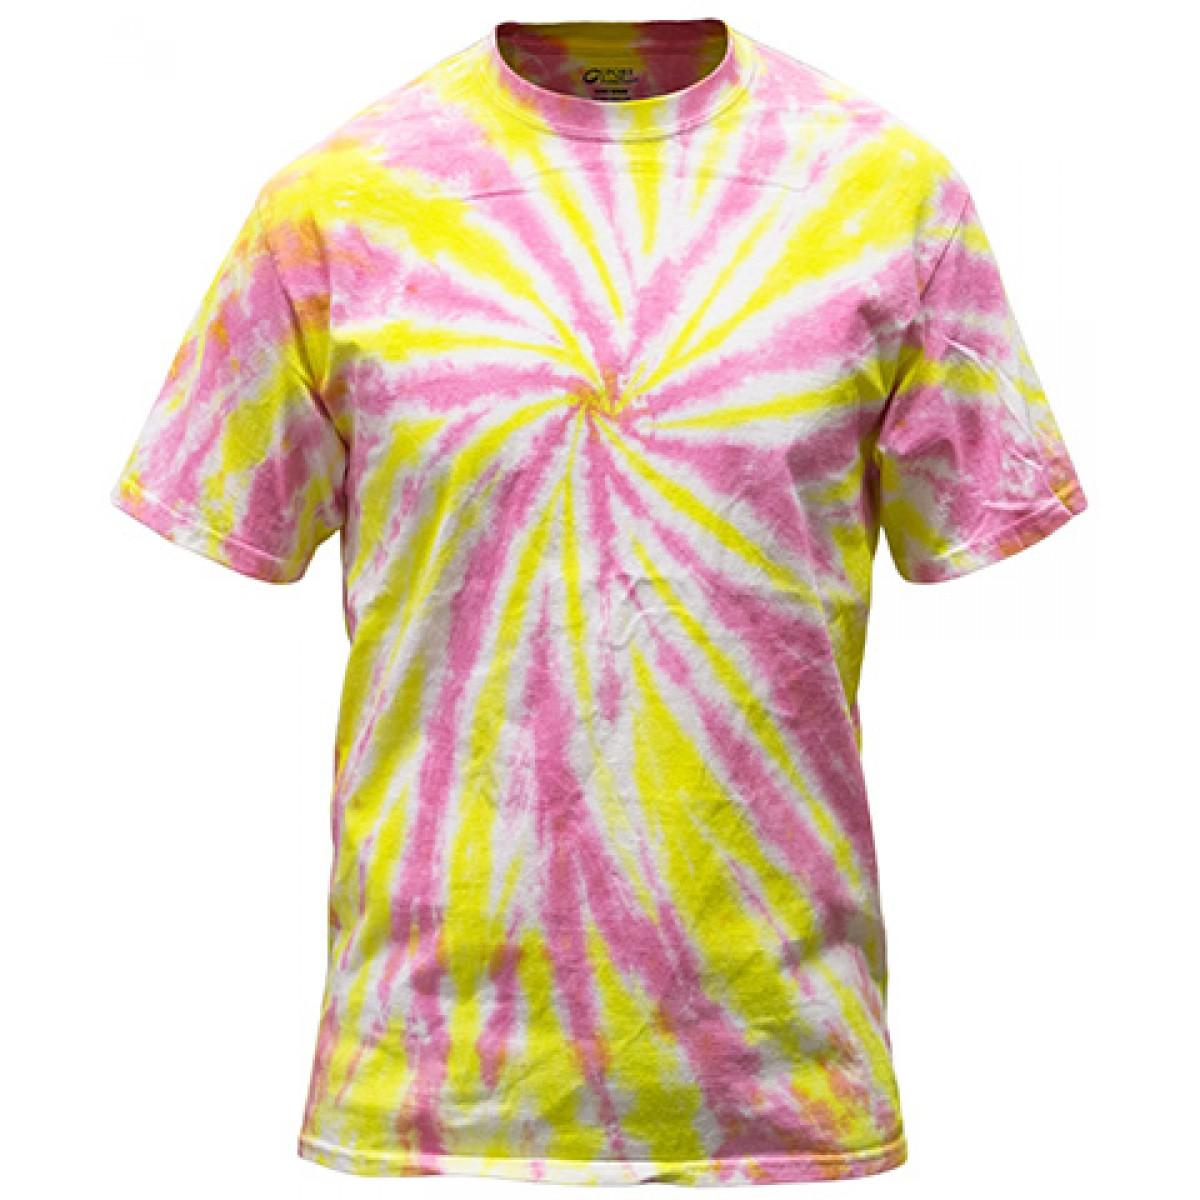 Multi-Color Tie-Dye Tee -Pink/Yellow-YM